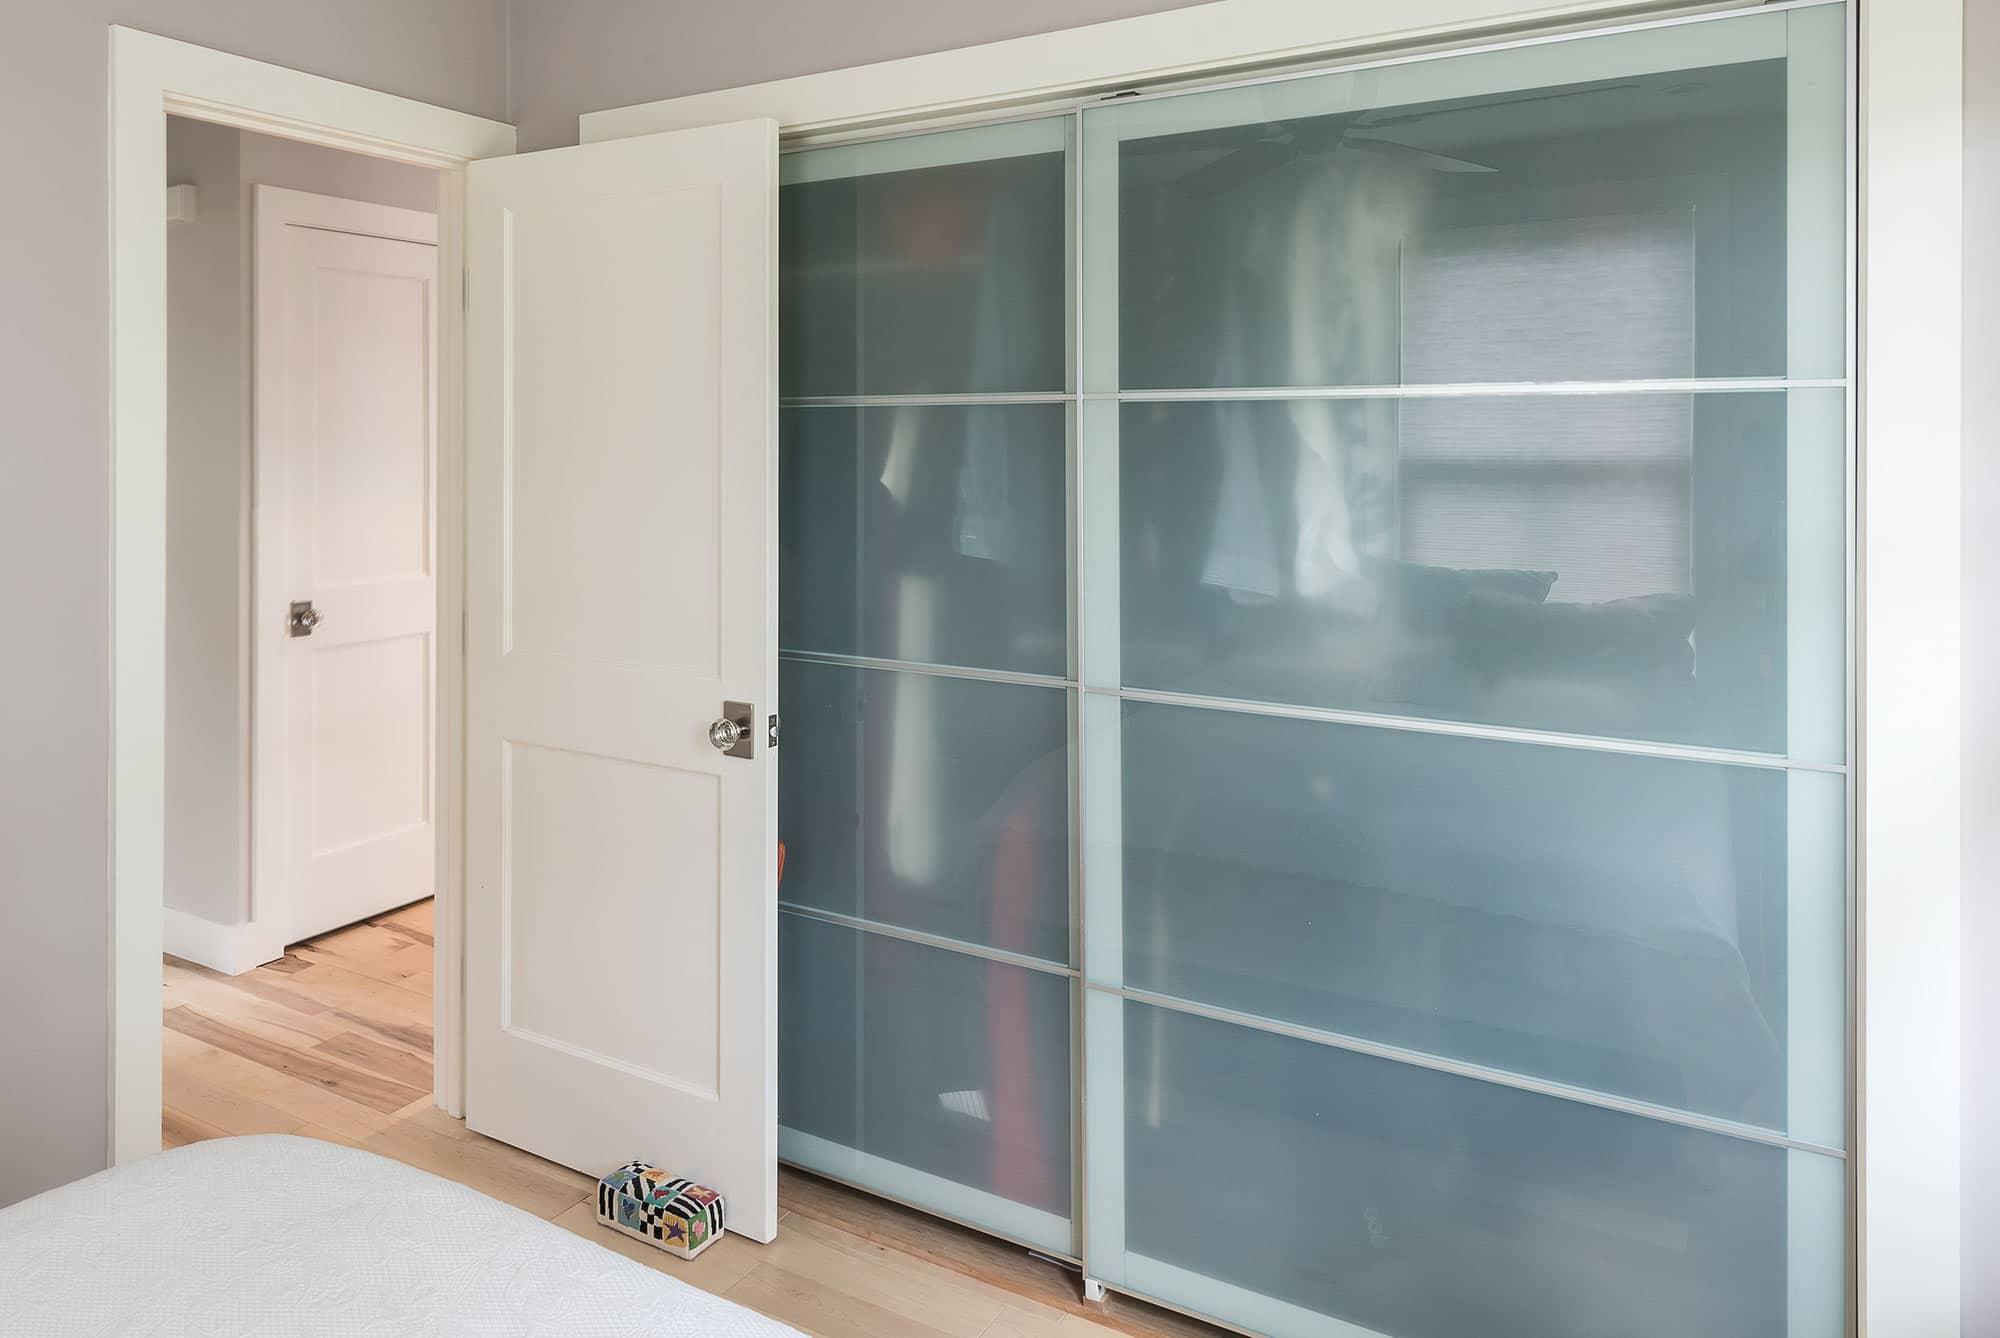 Bungalow Remodel Closet